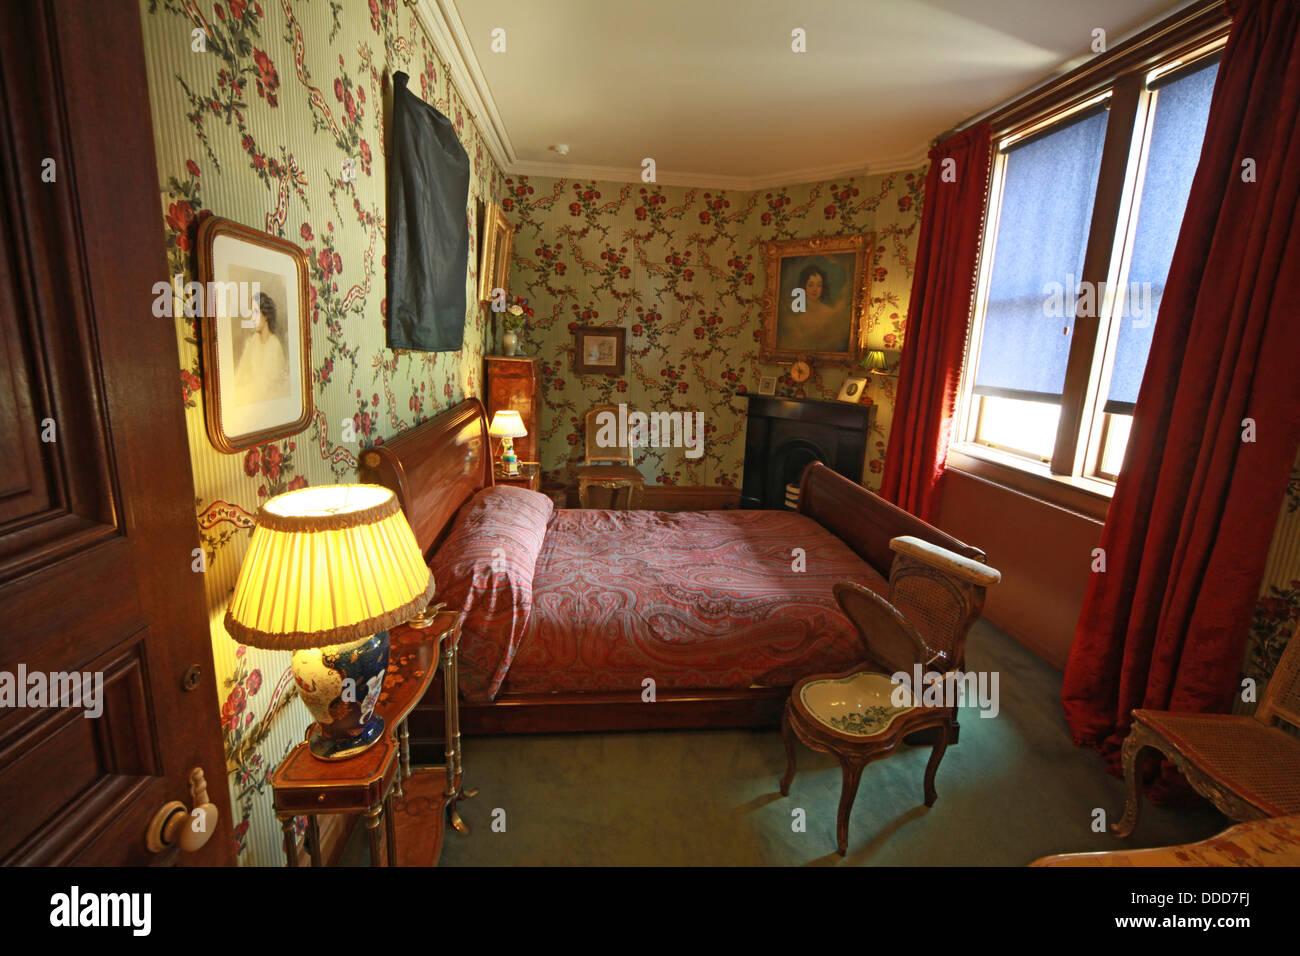 Dieses Stockfoto: Schlafzimmer im Waddesdon Manor, Buckinghamshire, England - DDD7FJ